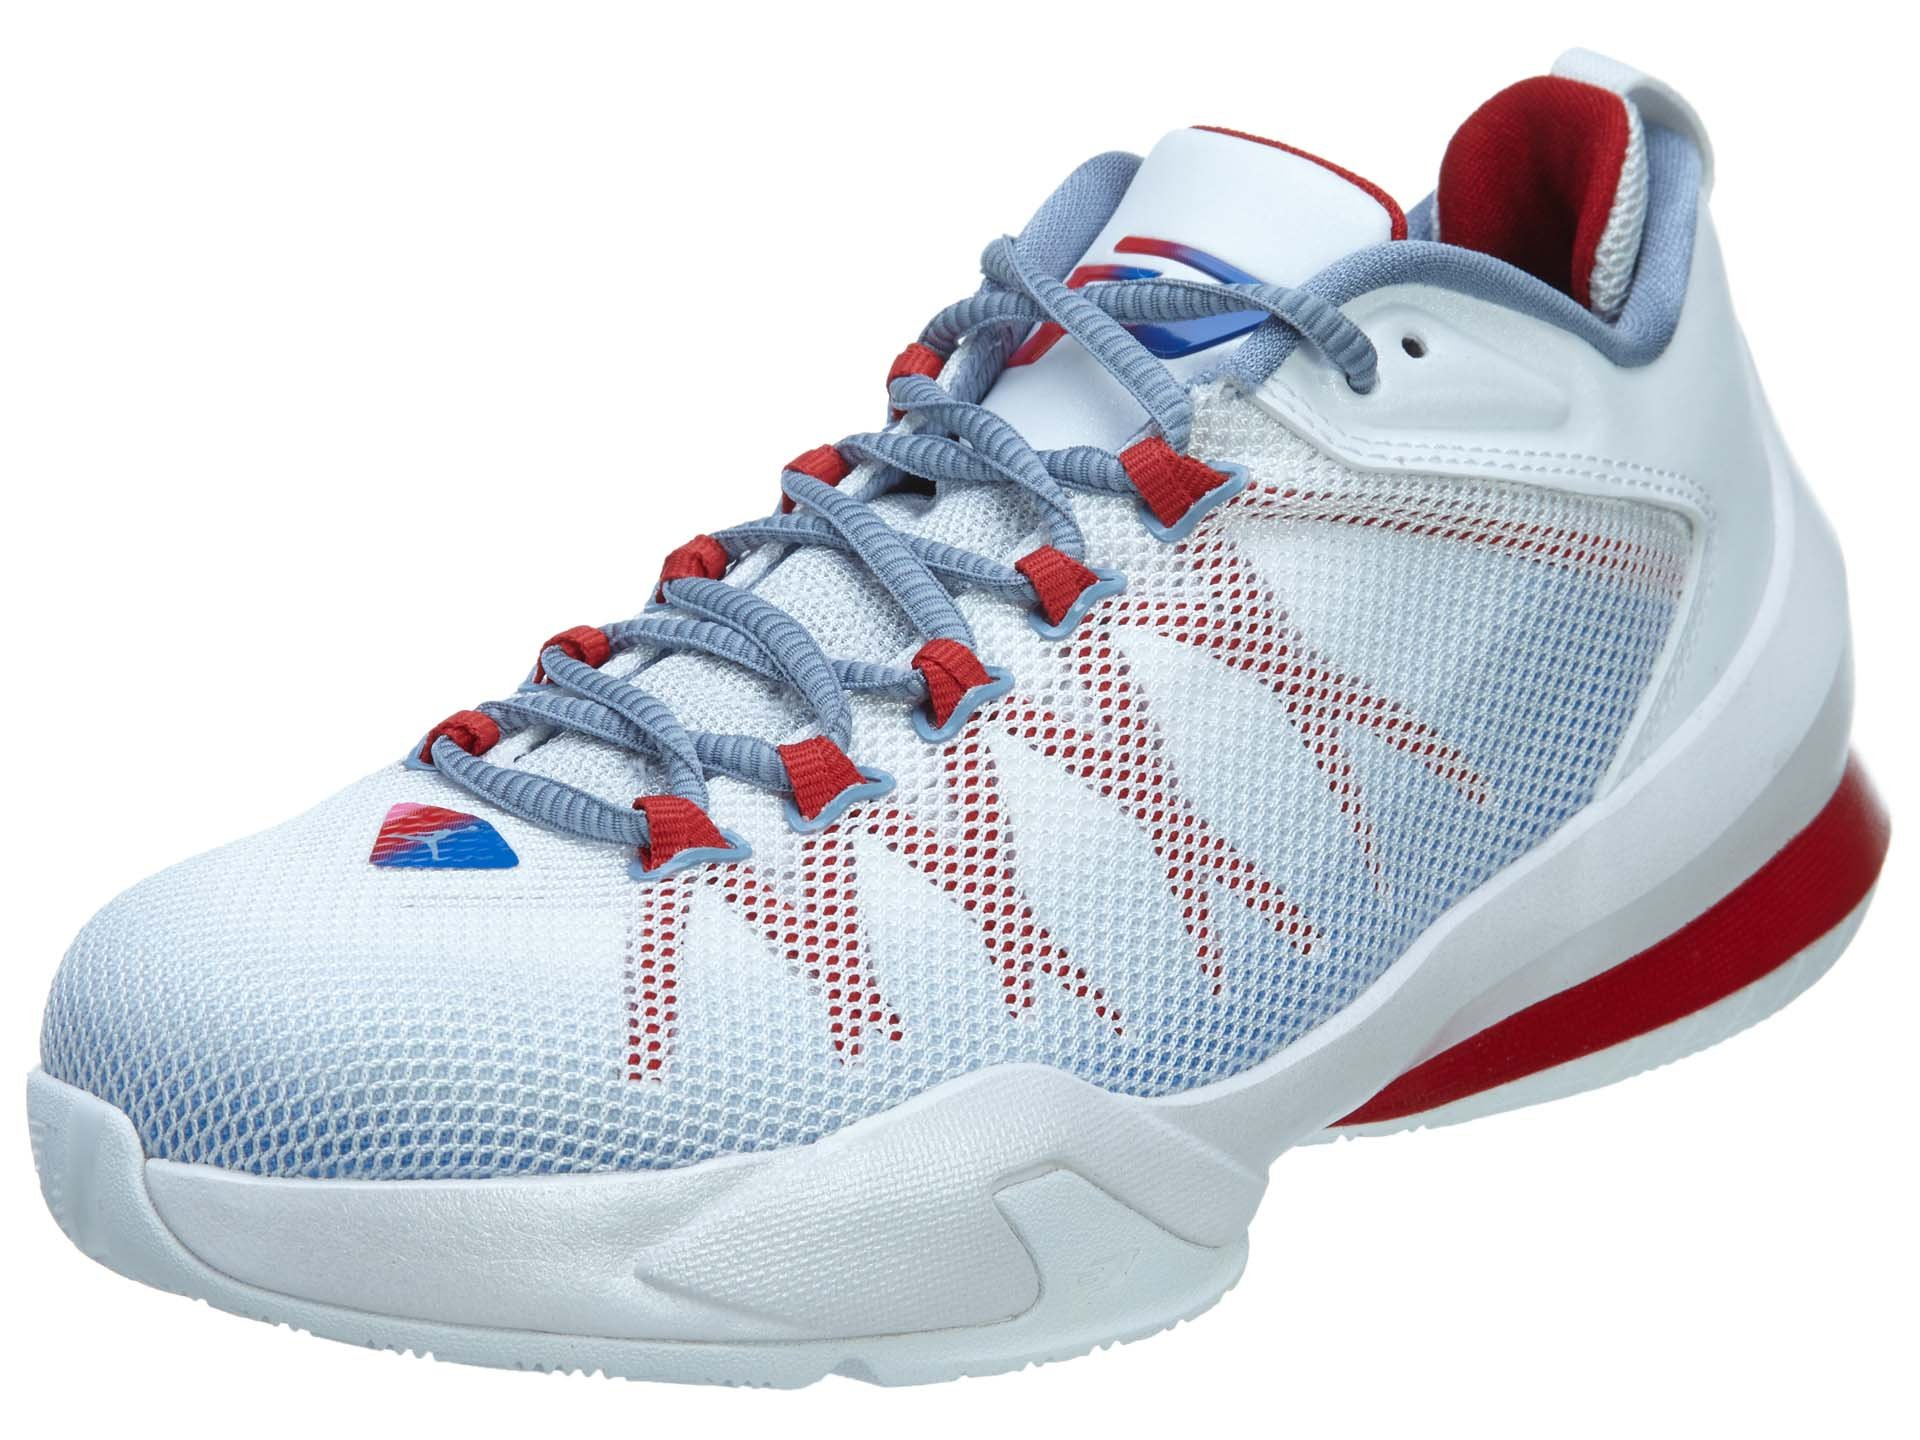 huge discount 52f06 65b60 Nike Jordan Kids Jordan CP3.VIII AE Bg White/Game Royal/Sprt Rdd/Cl Bl  Basketball Shoe 5.5 Kids US